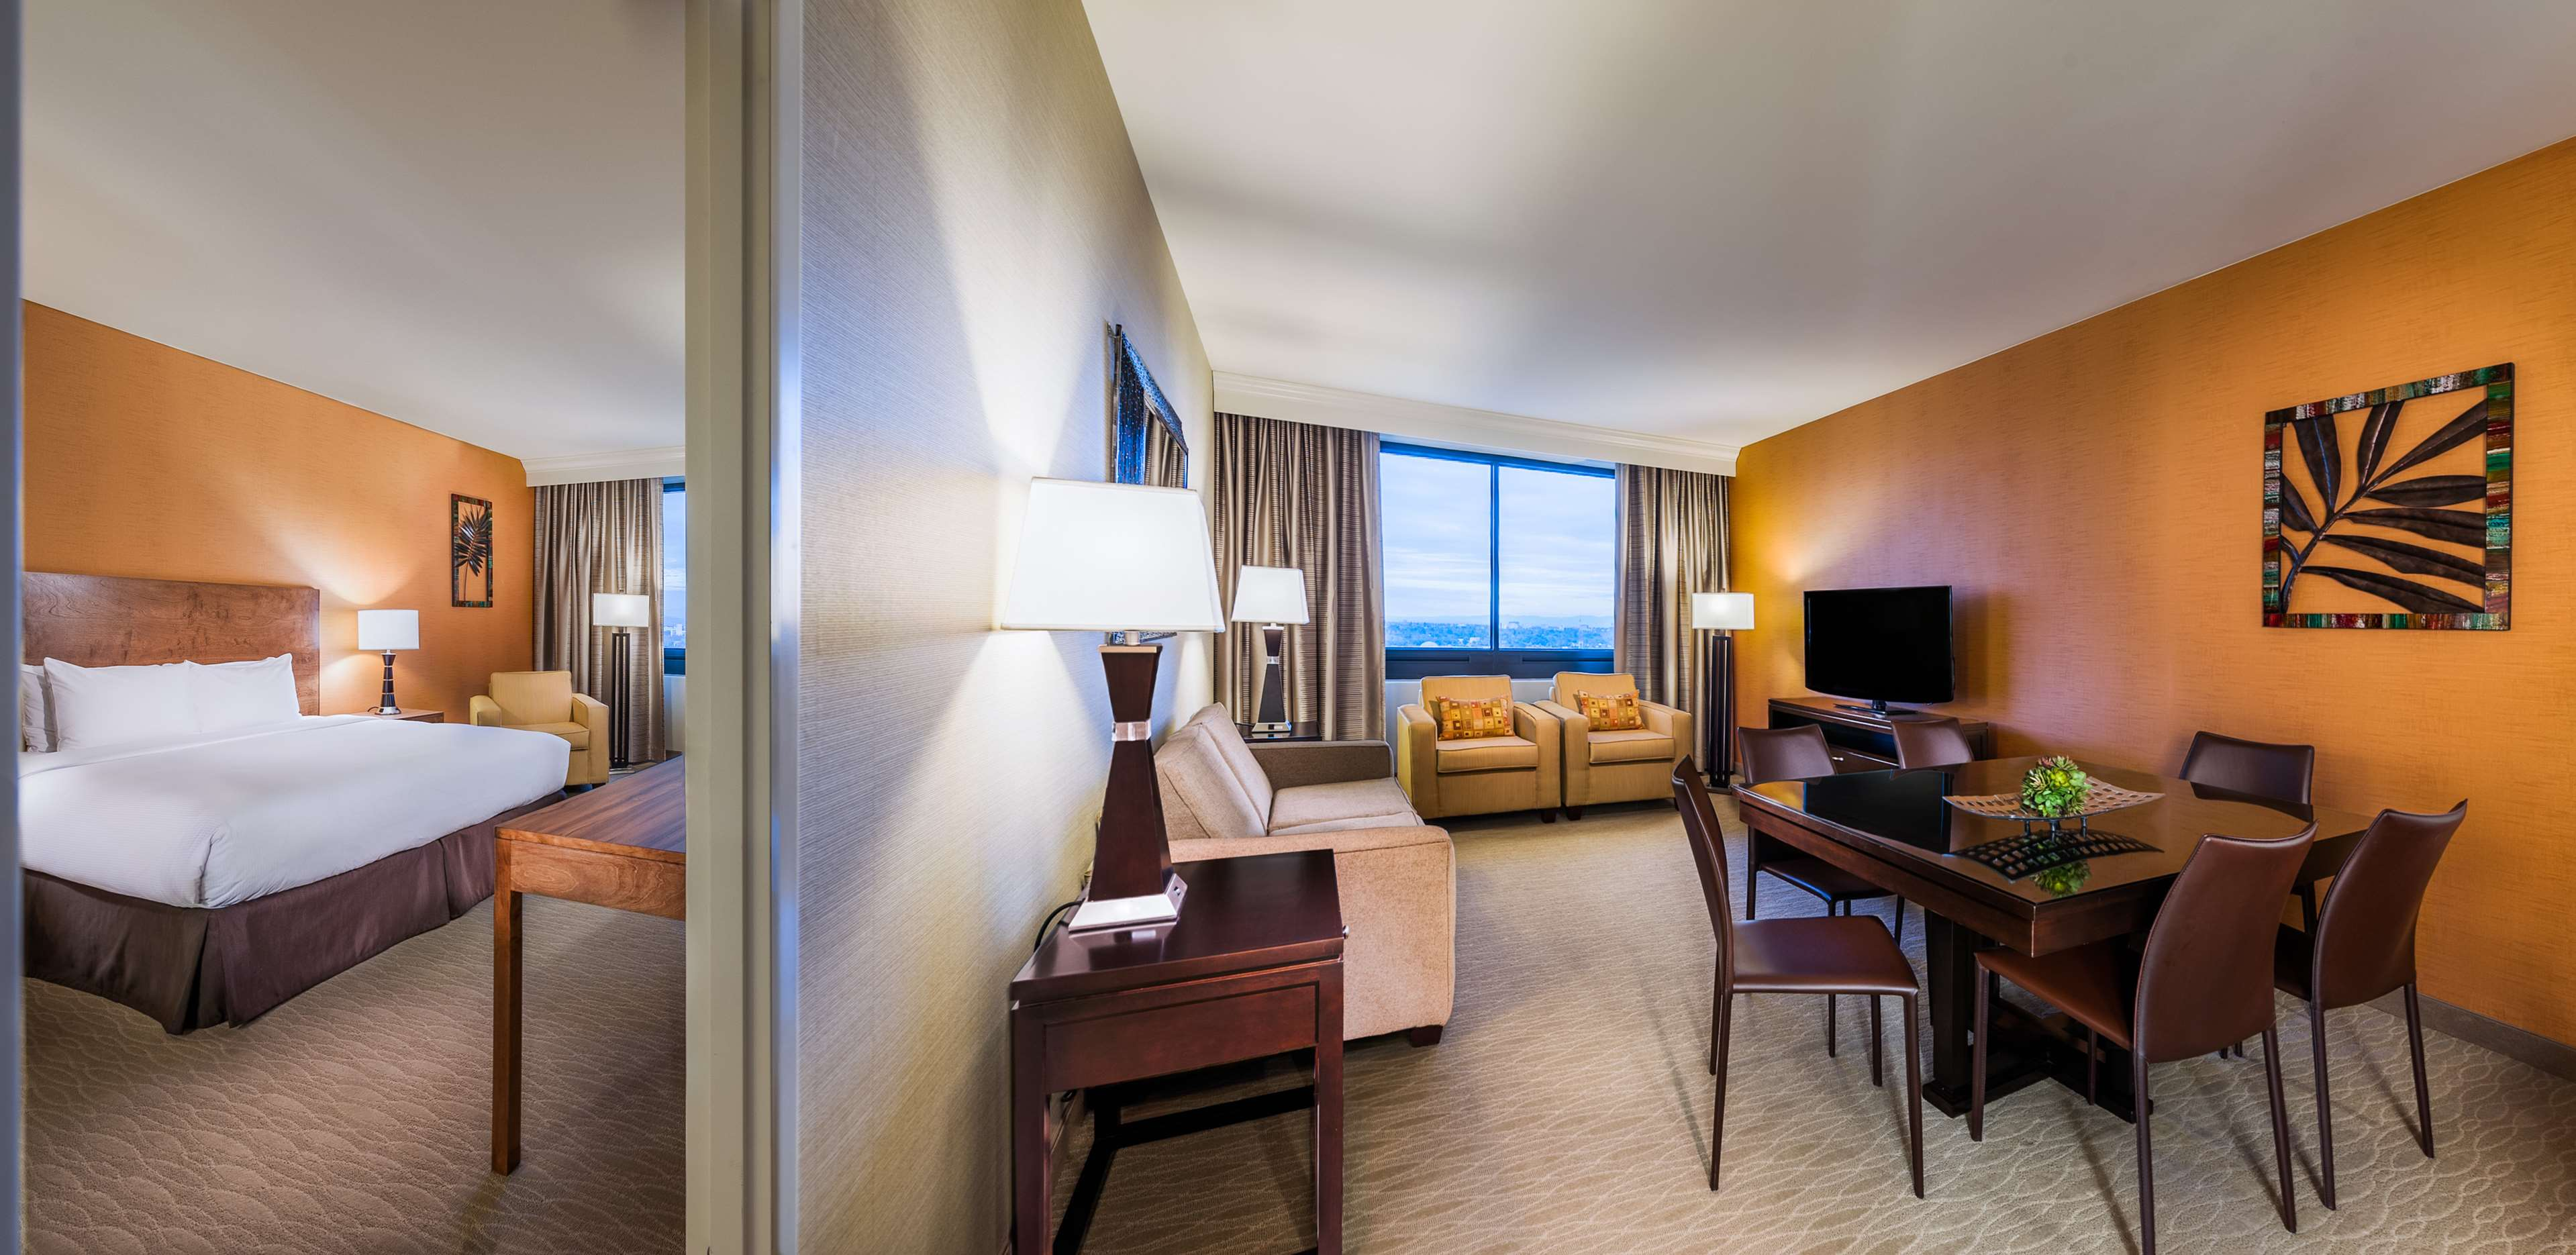 DoubleTree by Hilton Hotel Anaheim - Orange County image 35